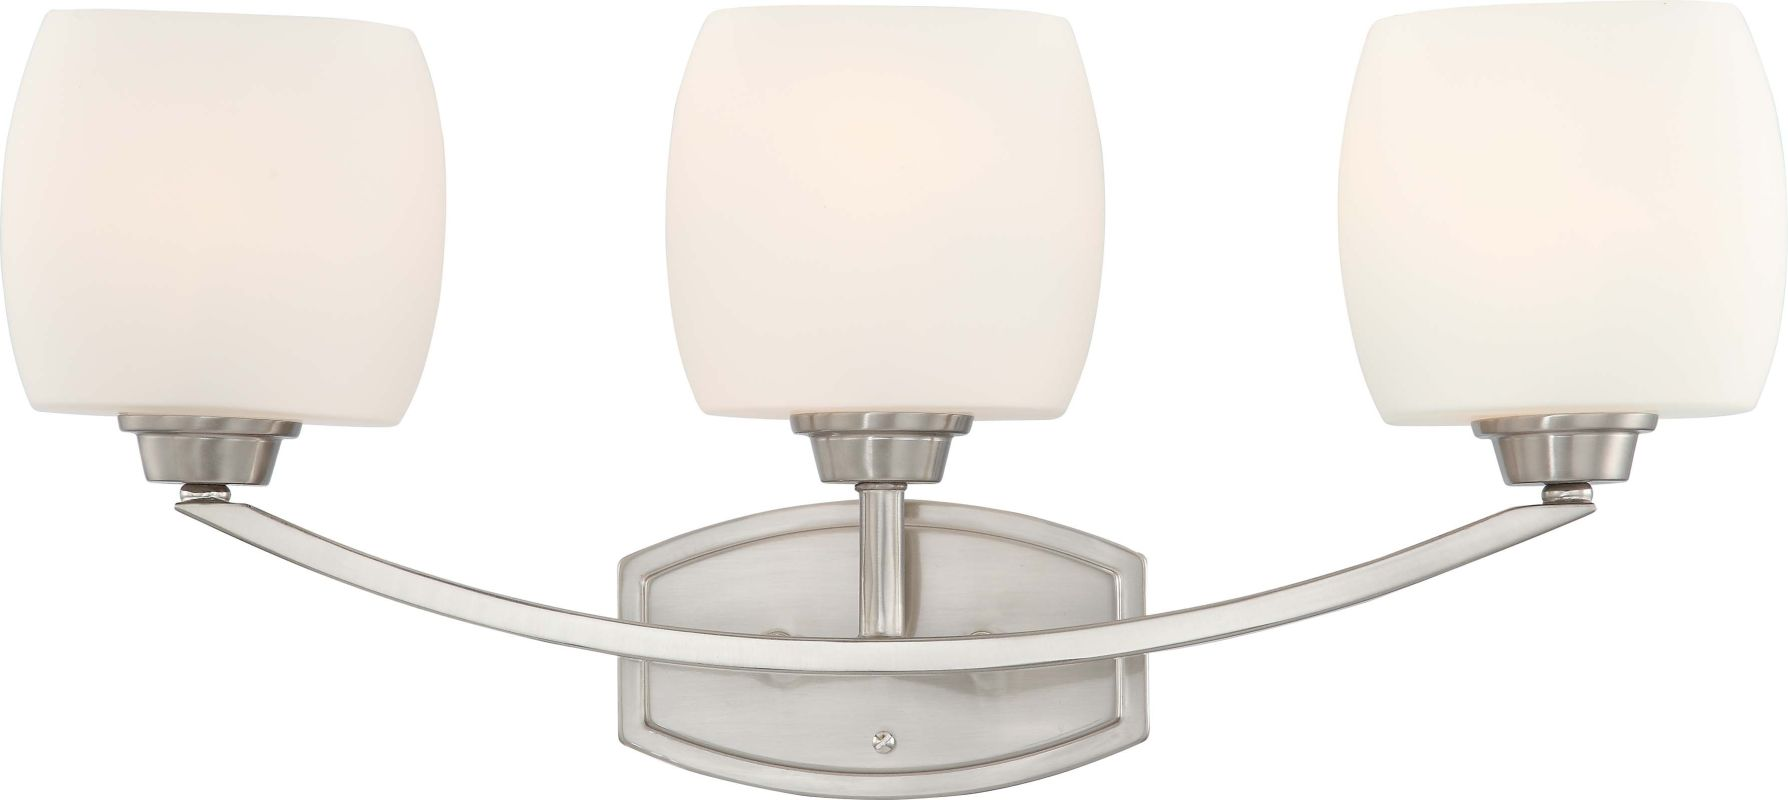 Nuvo Lighting 60/4183 Helium Three Light Bathroom Fixture with Satin